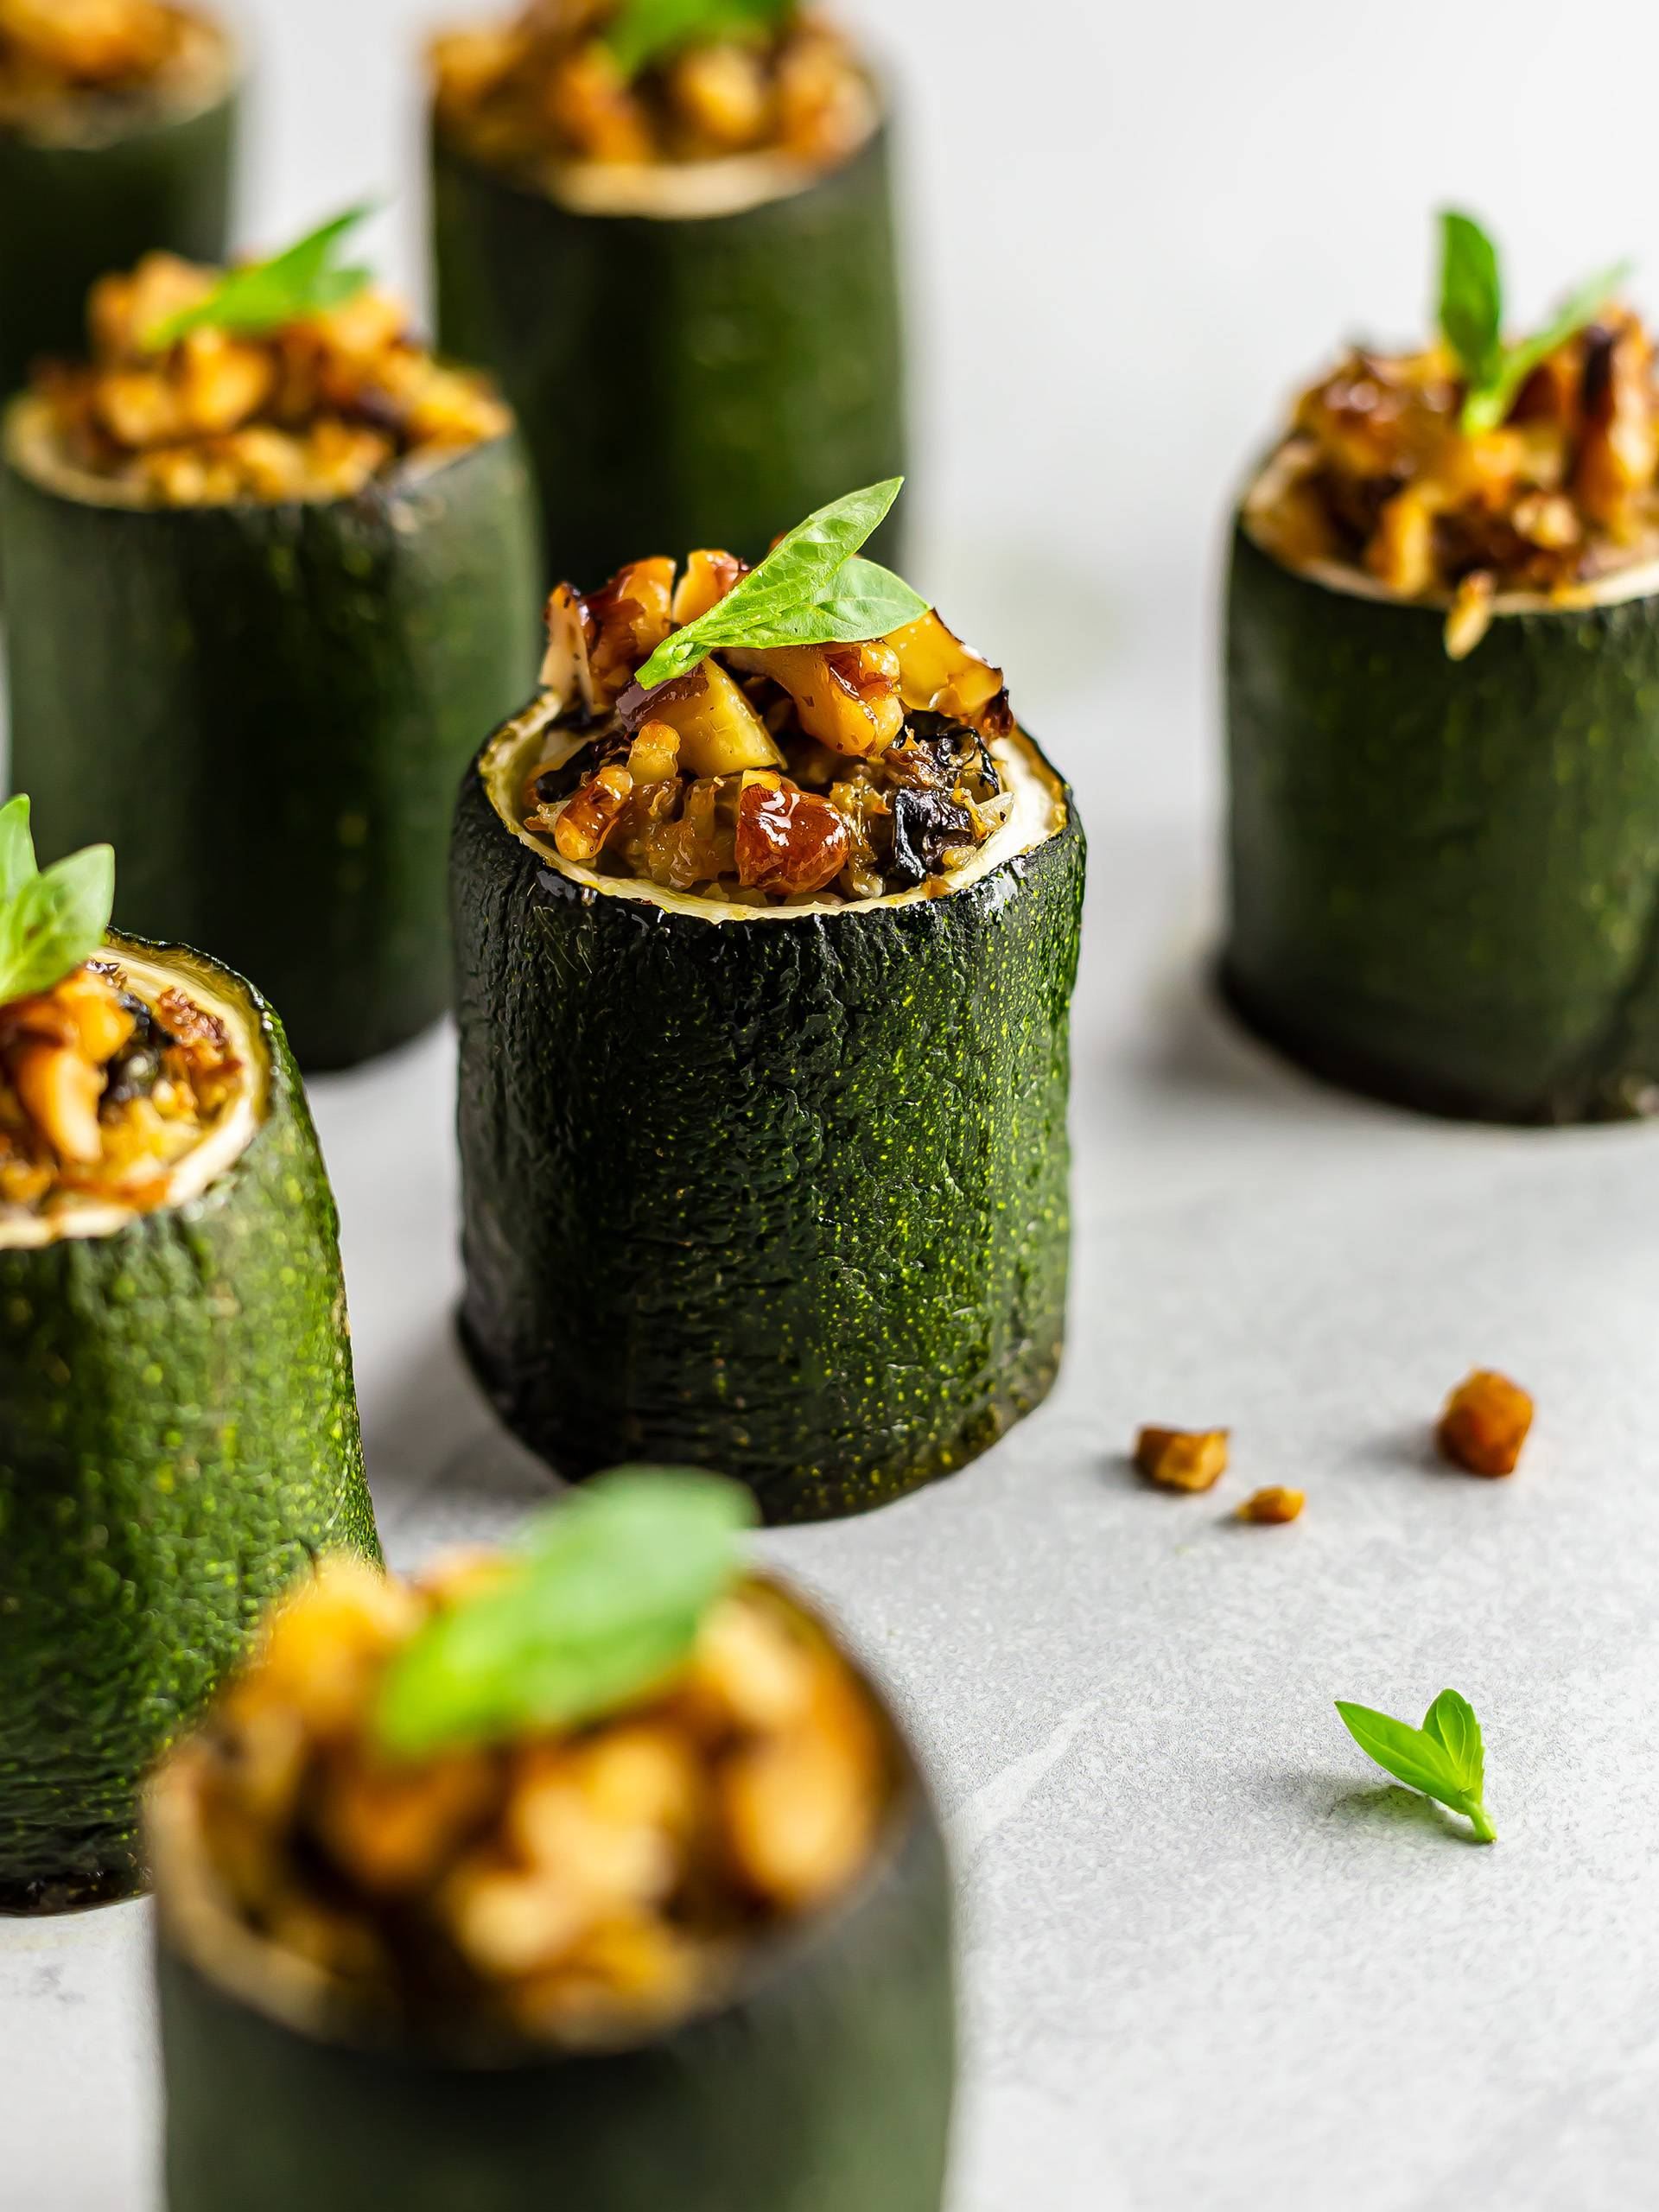 Vegan Low-Carb Stuffed Zucchini Cup